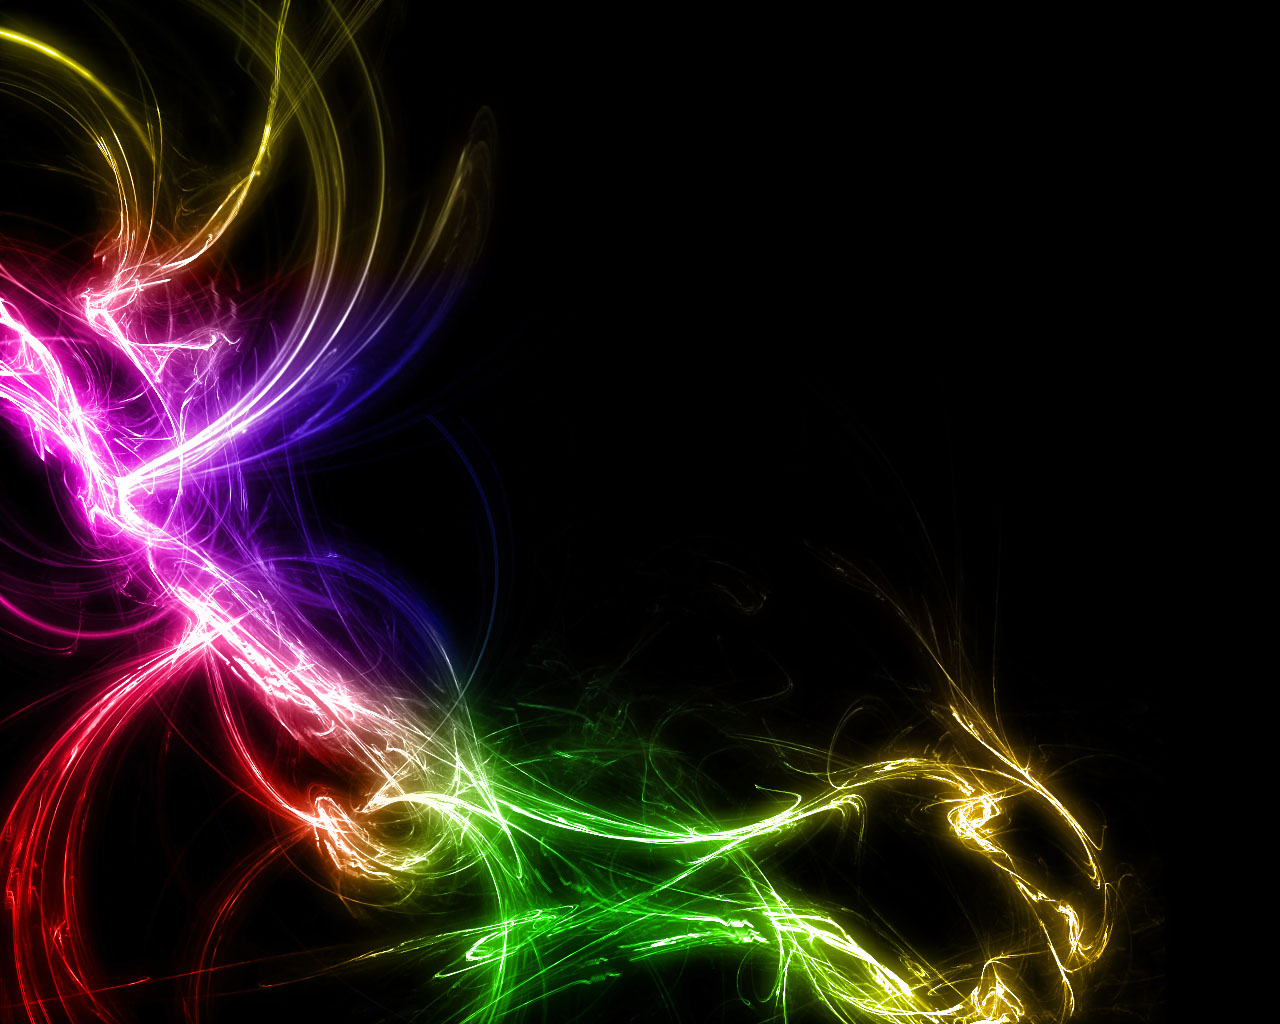 Amazing Background Images Images Fun 1280x1024